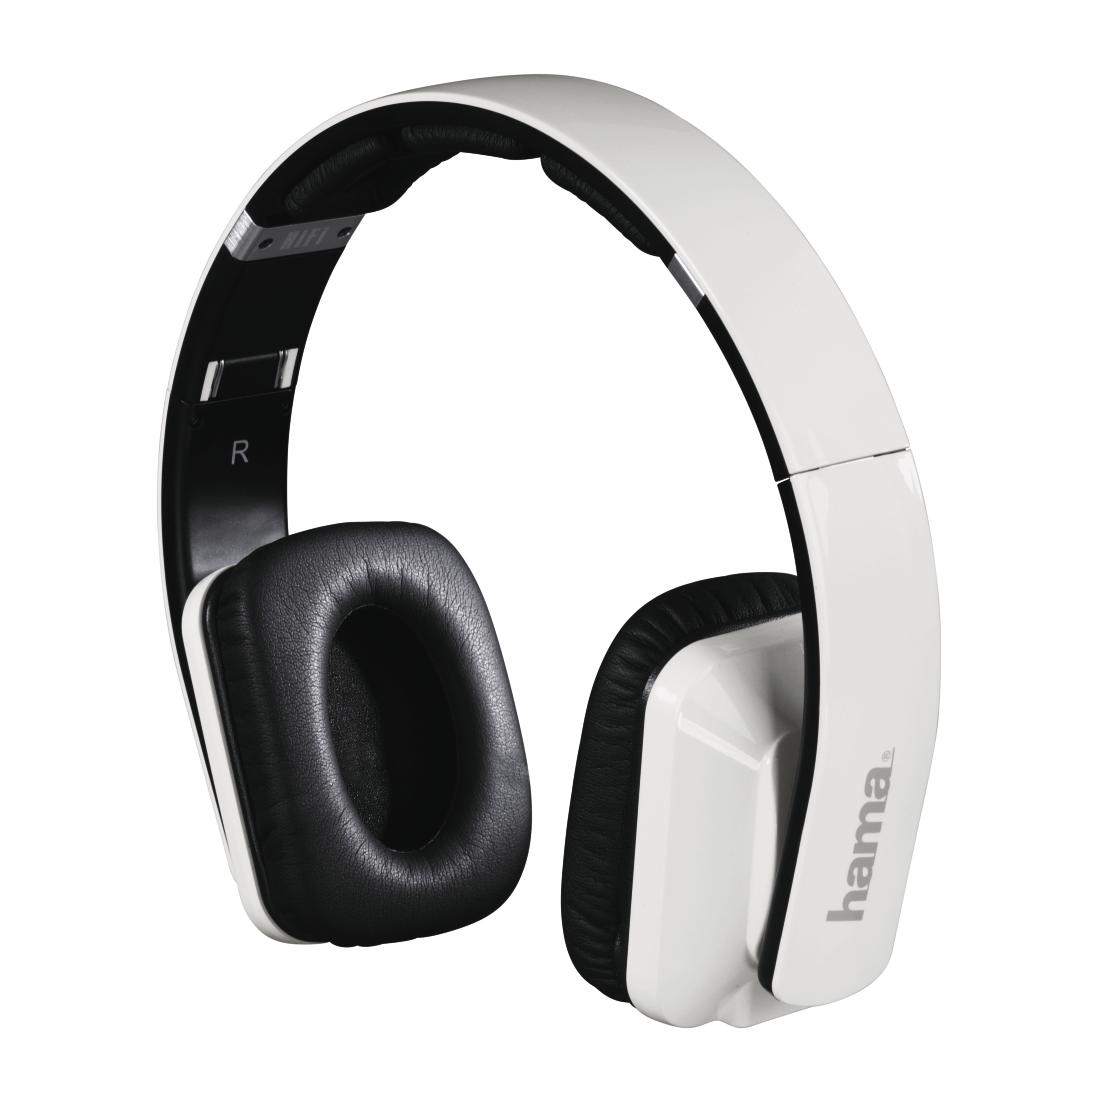 00015664 hama bluetooth stereo headset revolution wei. Black Bedroom Furniture Sets. Home Design Ideas